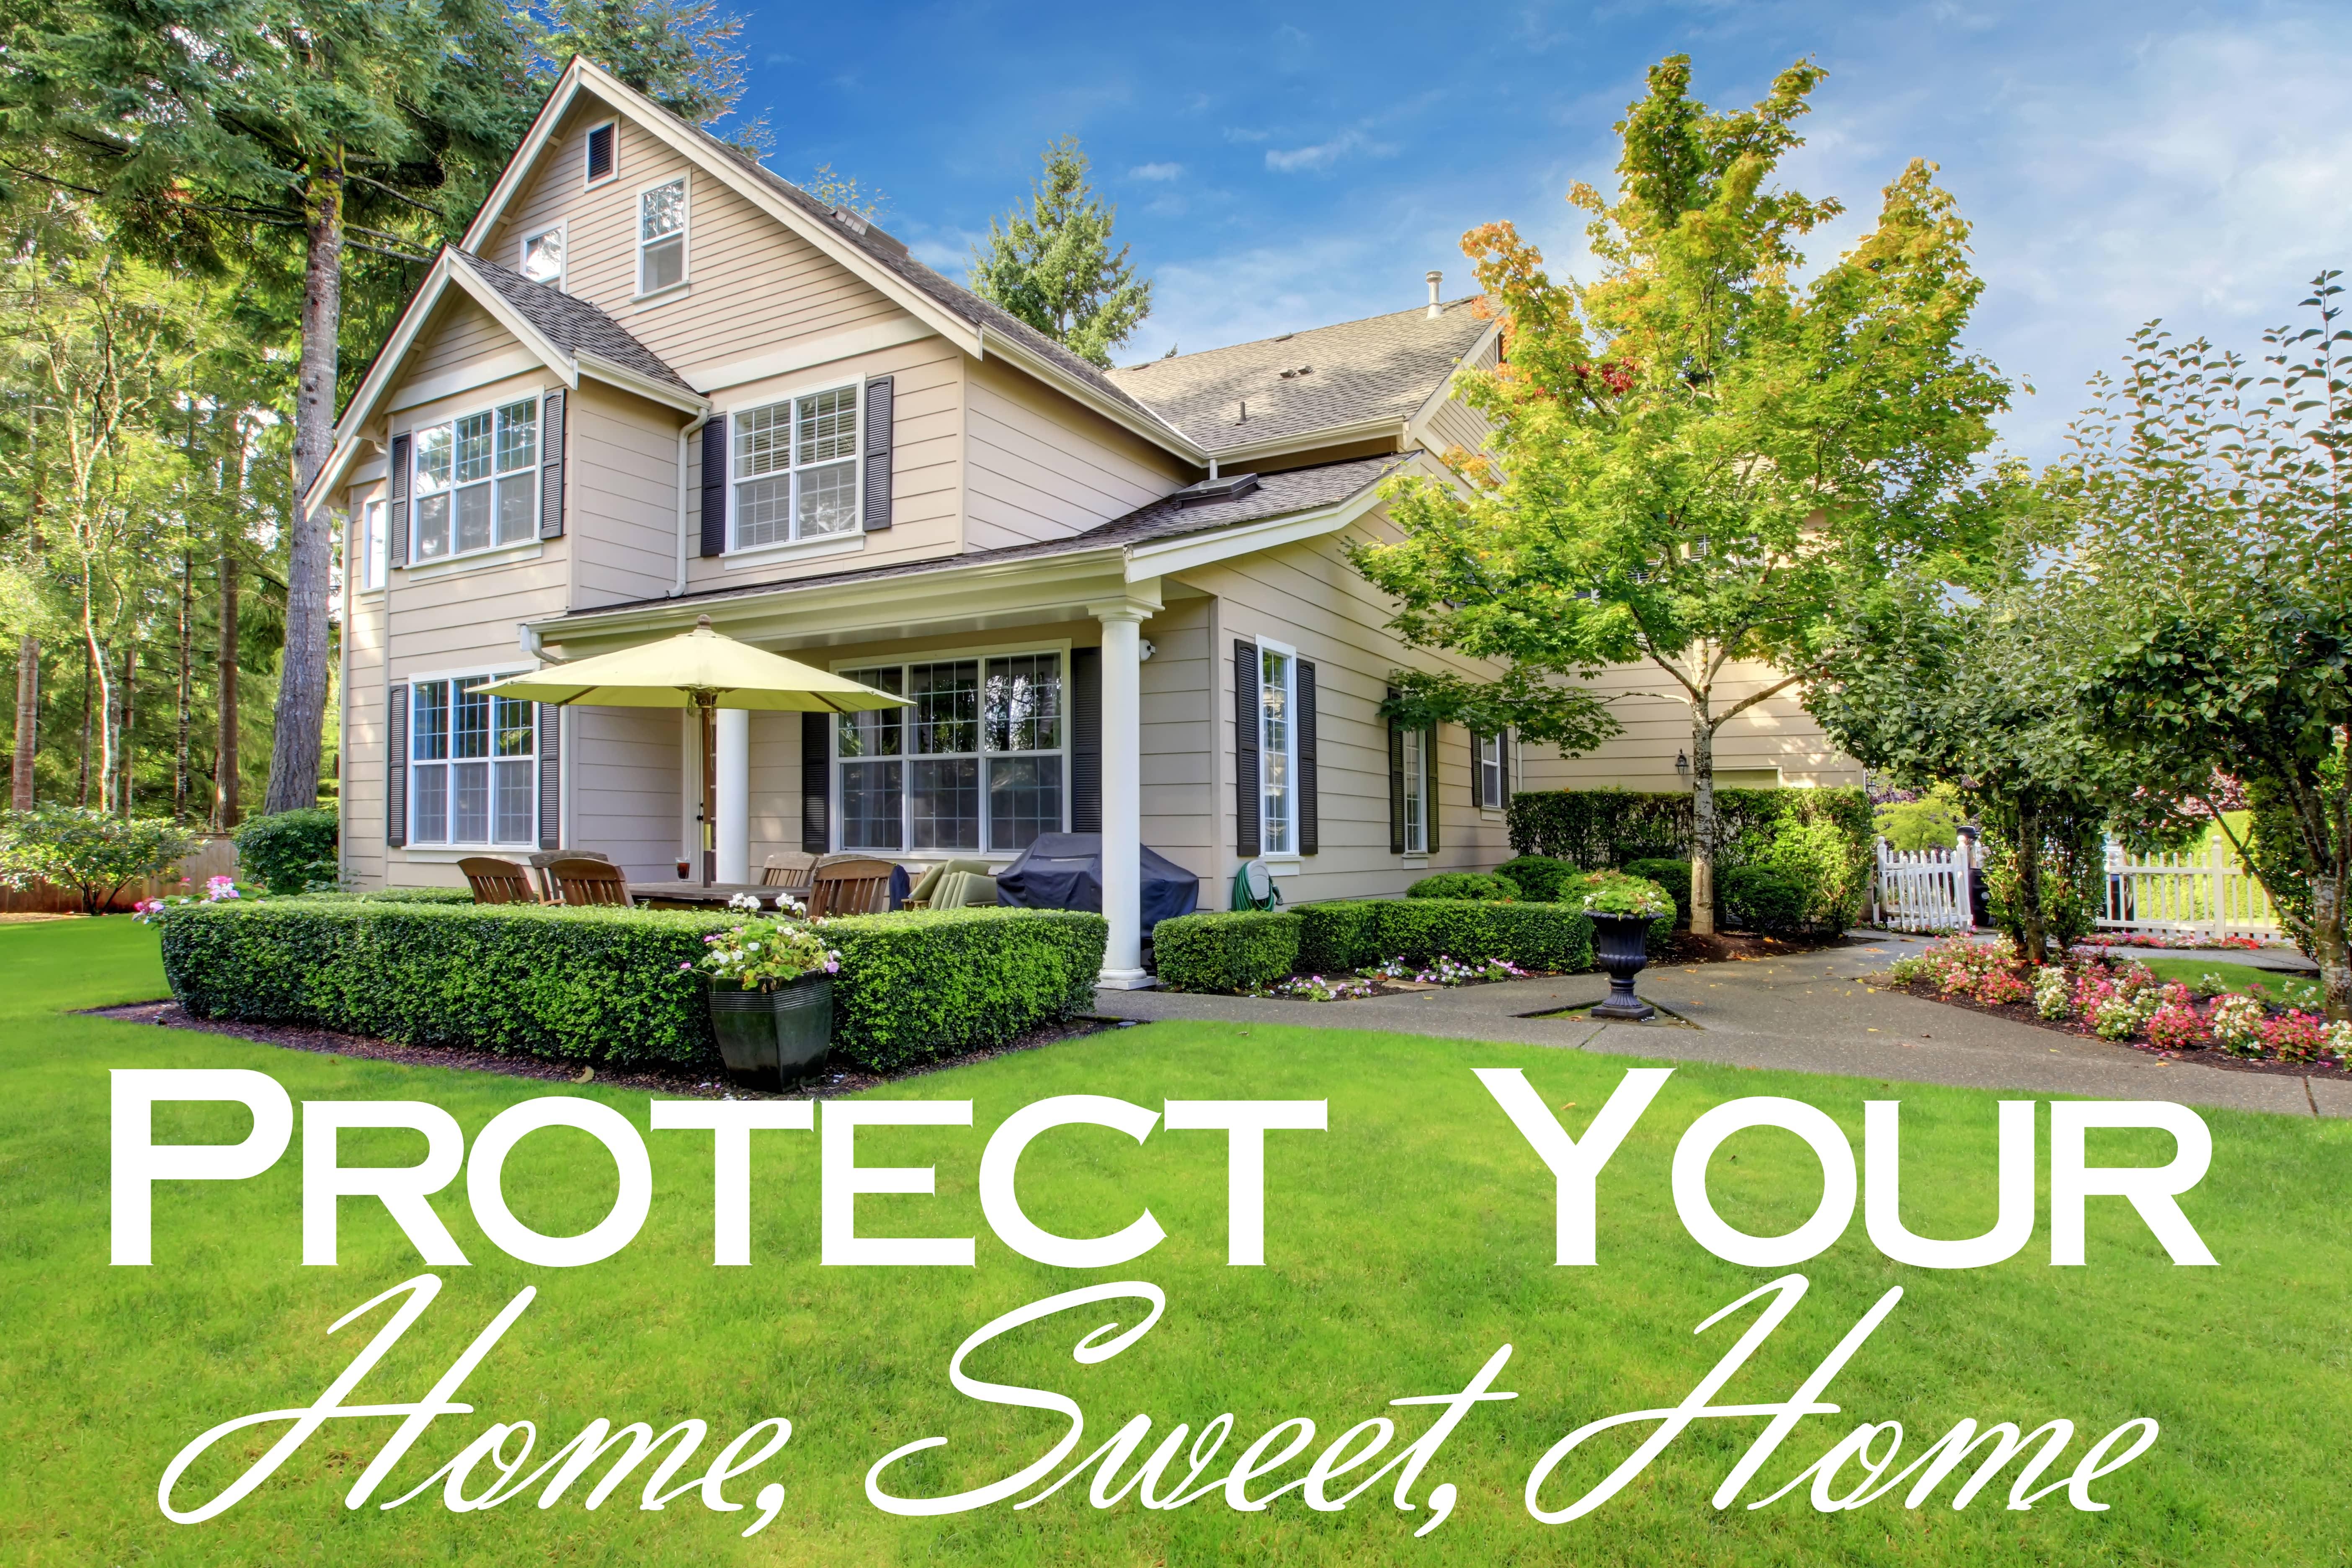 Home, Sweet, Home - SaveUmore Insurance Agency